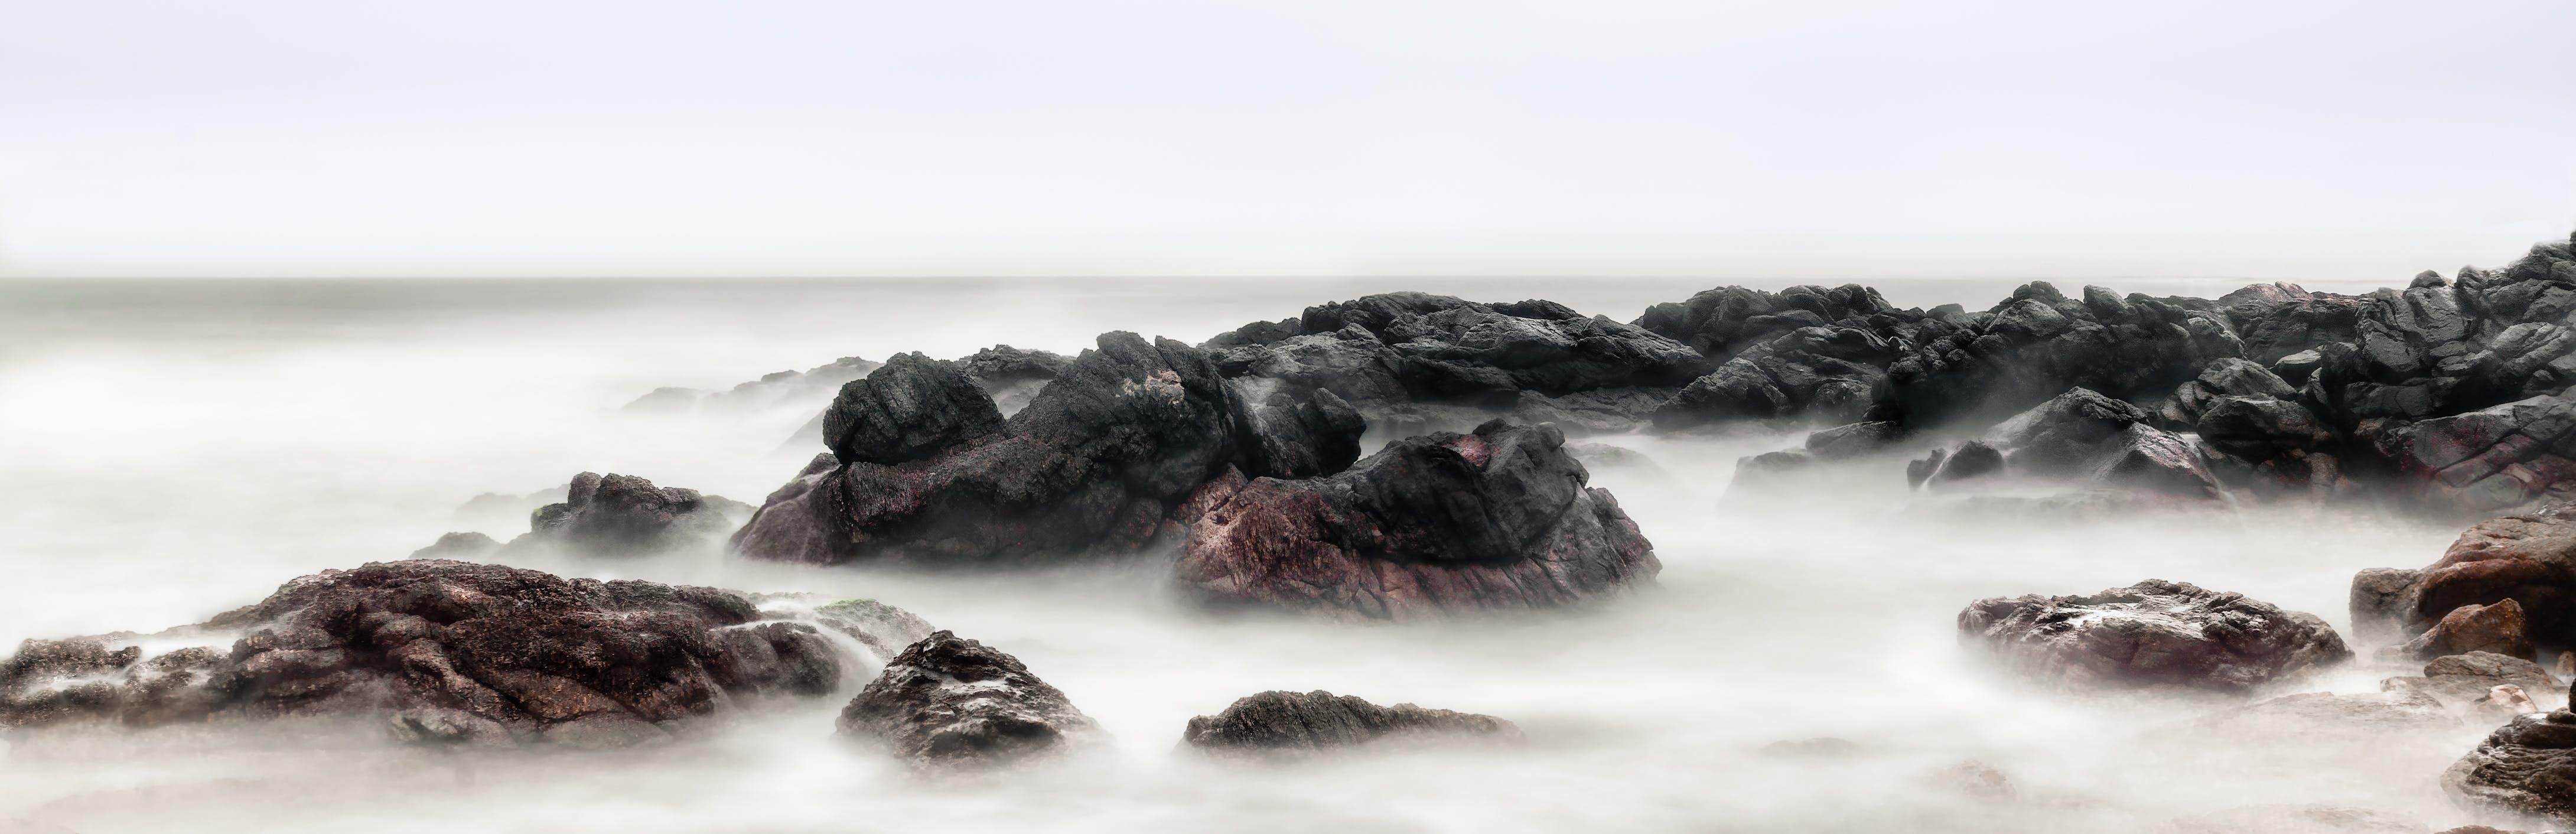 Black Rock With Fog